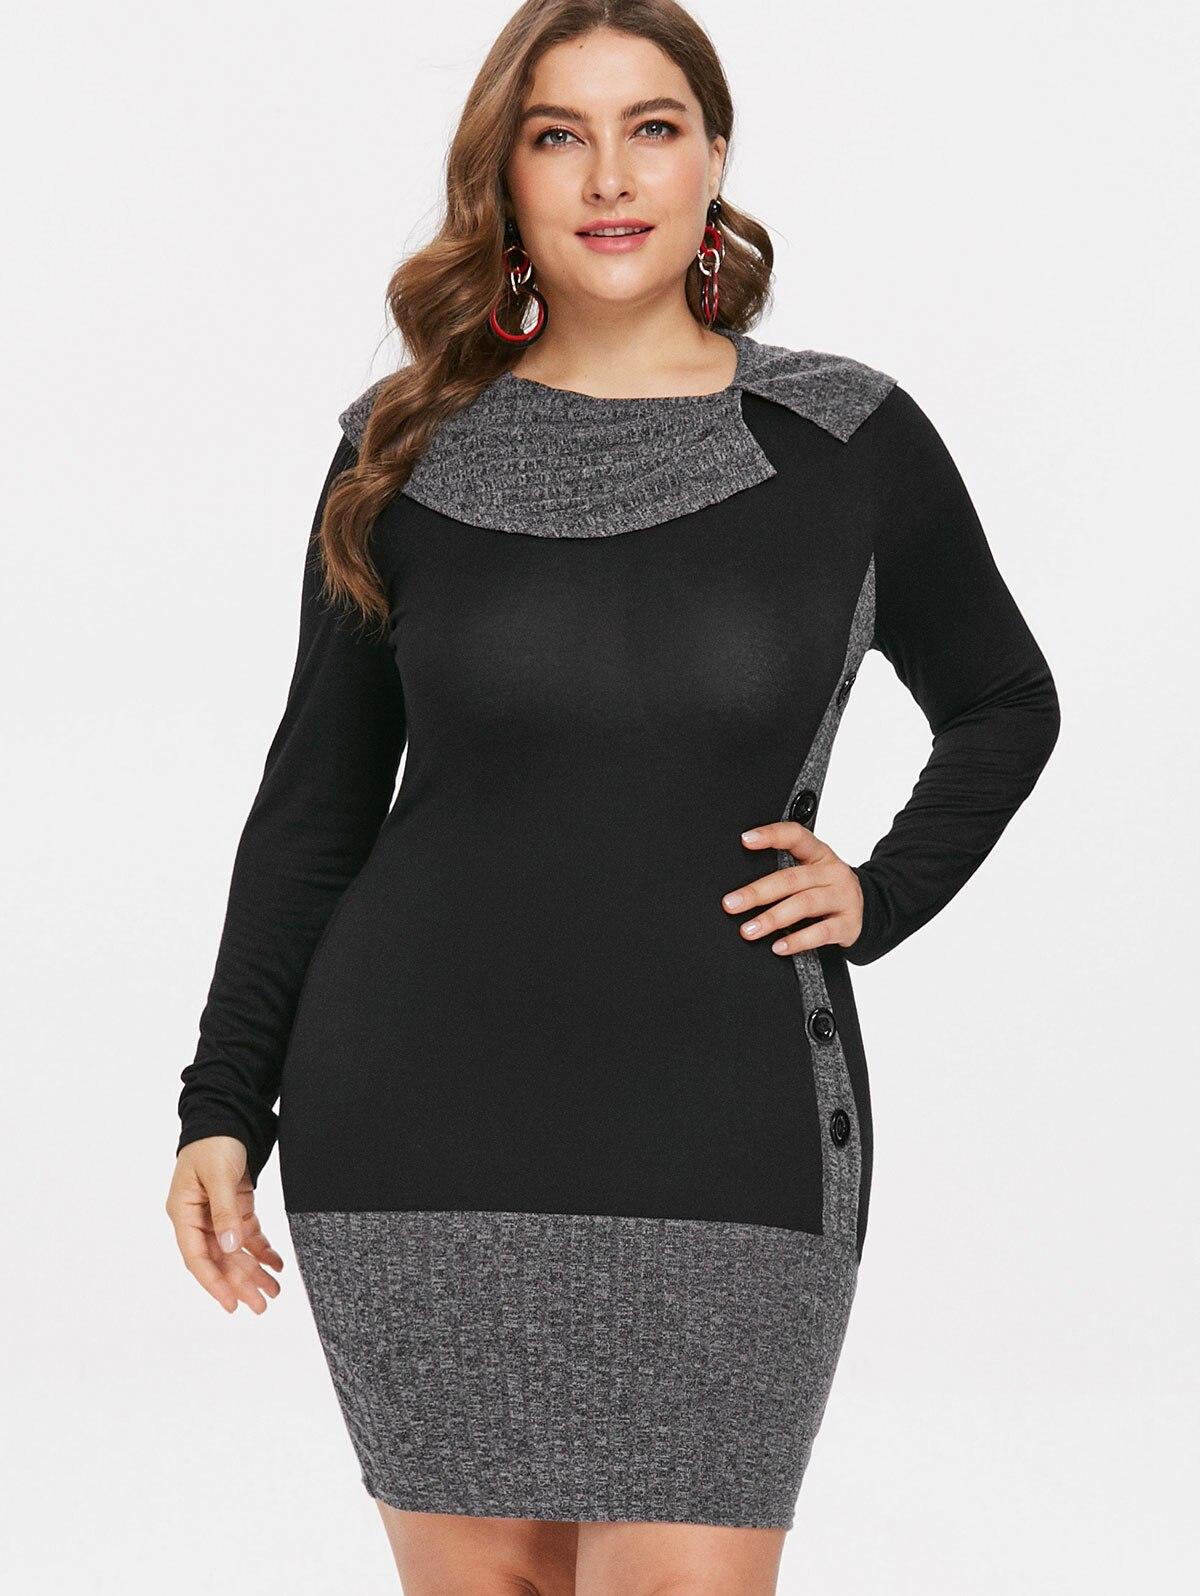 Wipalo Plus Size 5XL Fashion Long Sleeve Ladies Button Embellished Sheath  Dress Casual Knee Length Bodycon Dress Robe Femme Summer White Maxi Dress  ...